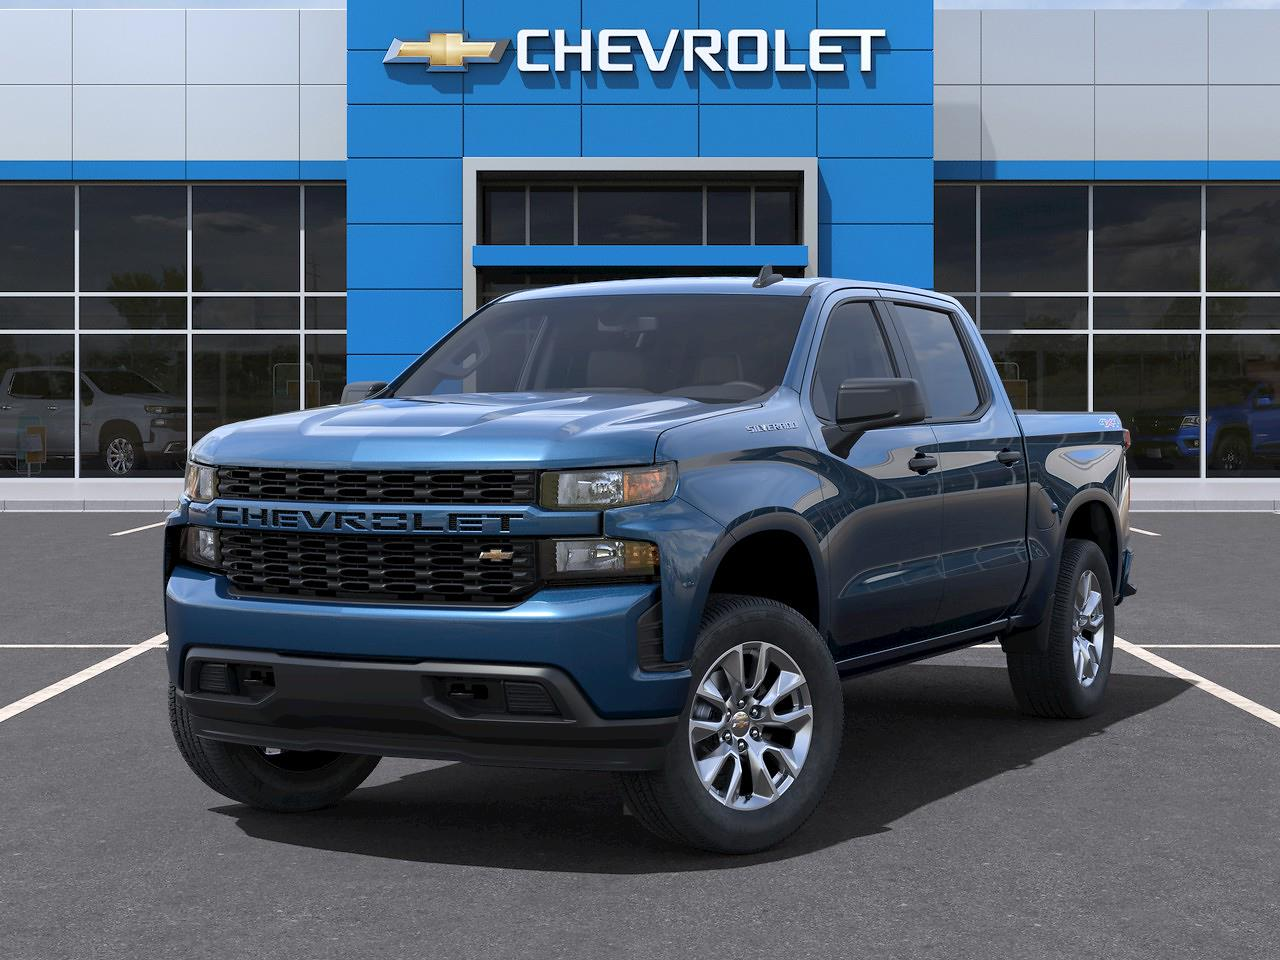 2021 Chevrolet Silverado 1500 Crew Cab 4x4, Pickup #Q210444 - photo 6